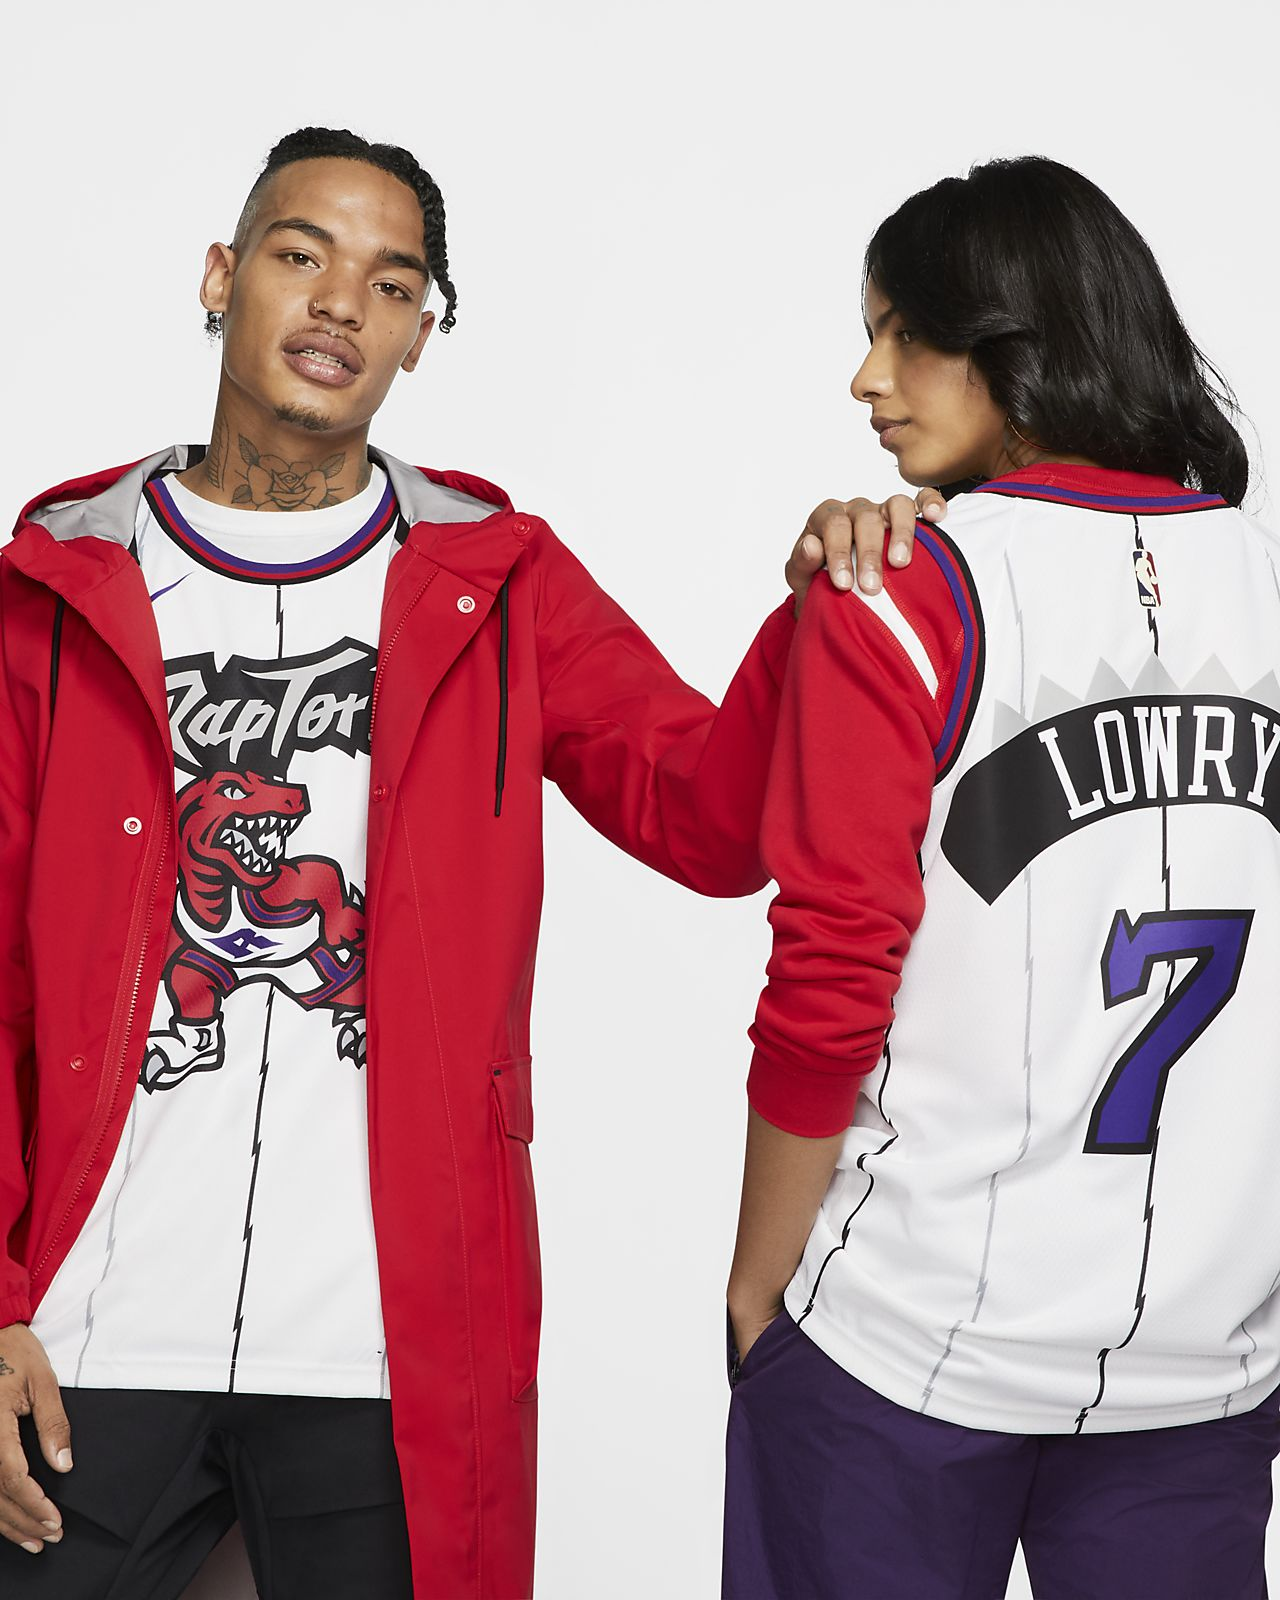 Maillot Nike NBA Swingman Kyle Lowry Raptors Classic Edition